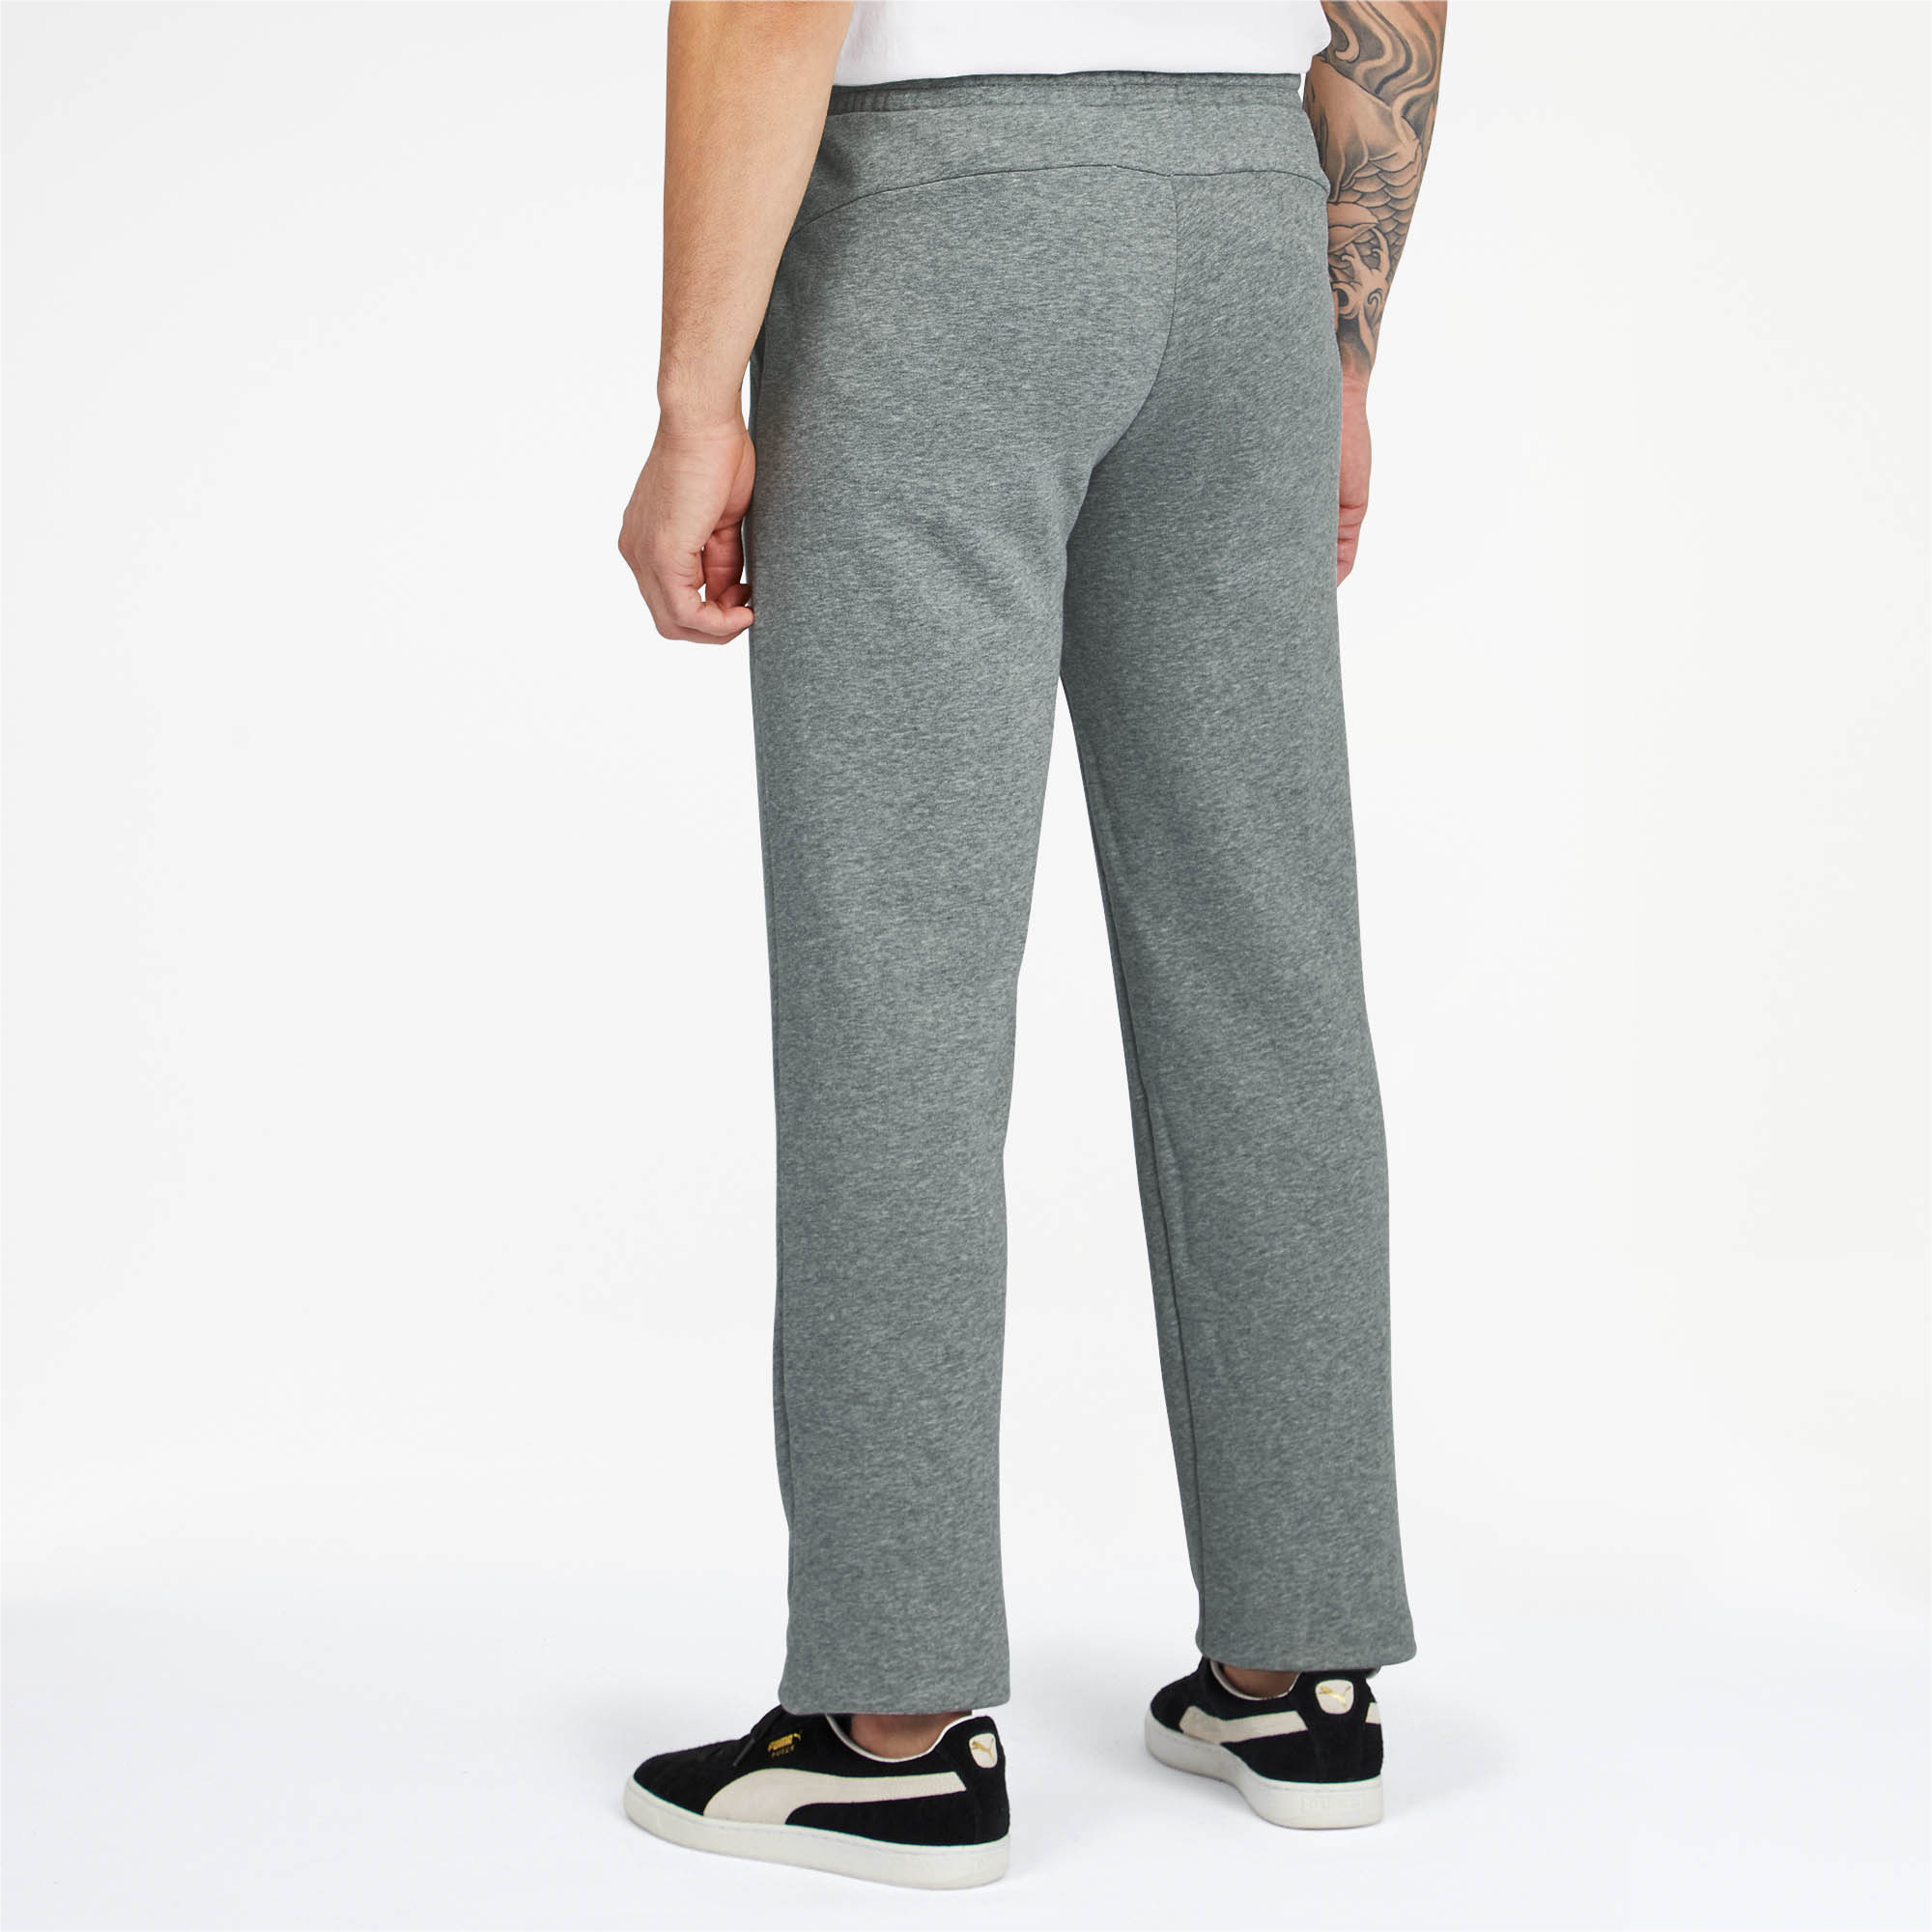 PUMA-Essentials-Men-039-s-Sweatpants-Men-Knitted-Pants-Basics thumbnail 10